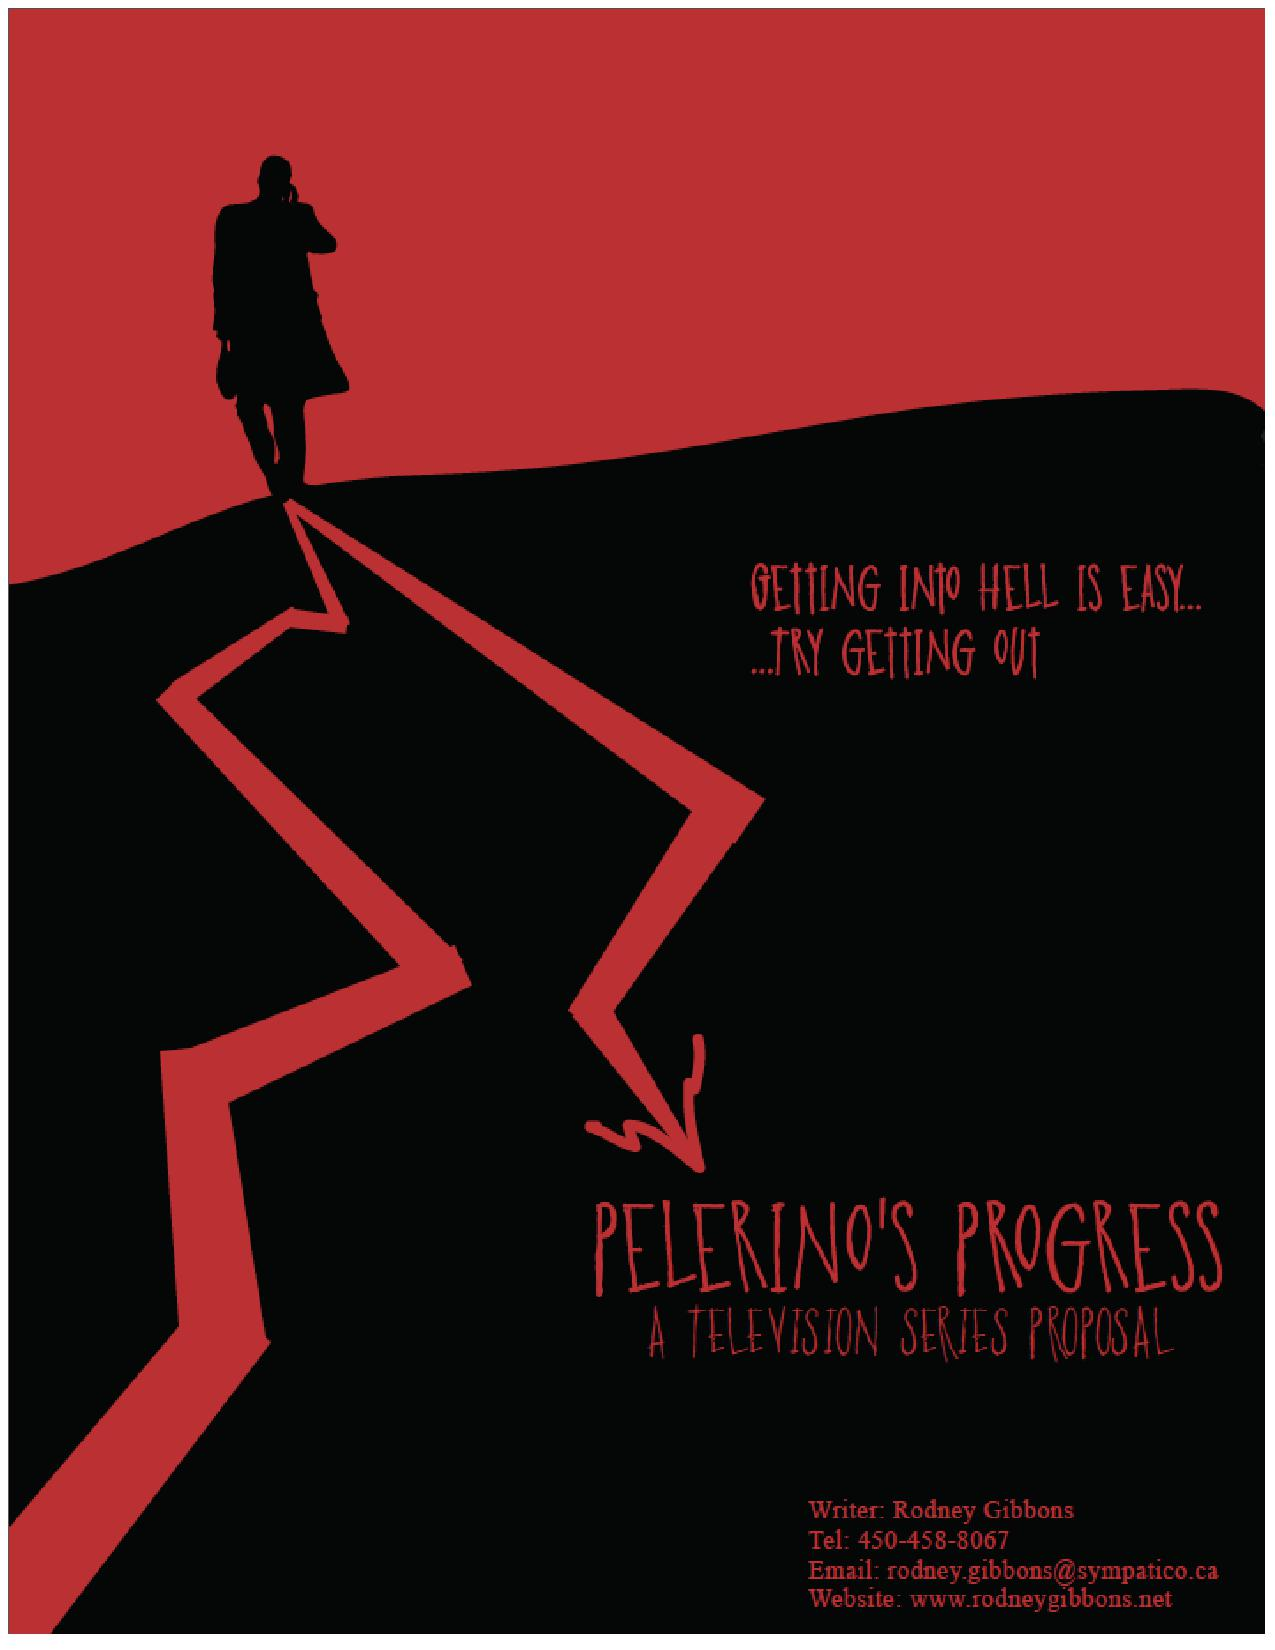 Pelerino's Progress